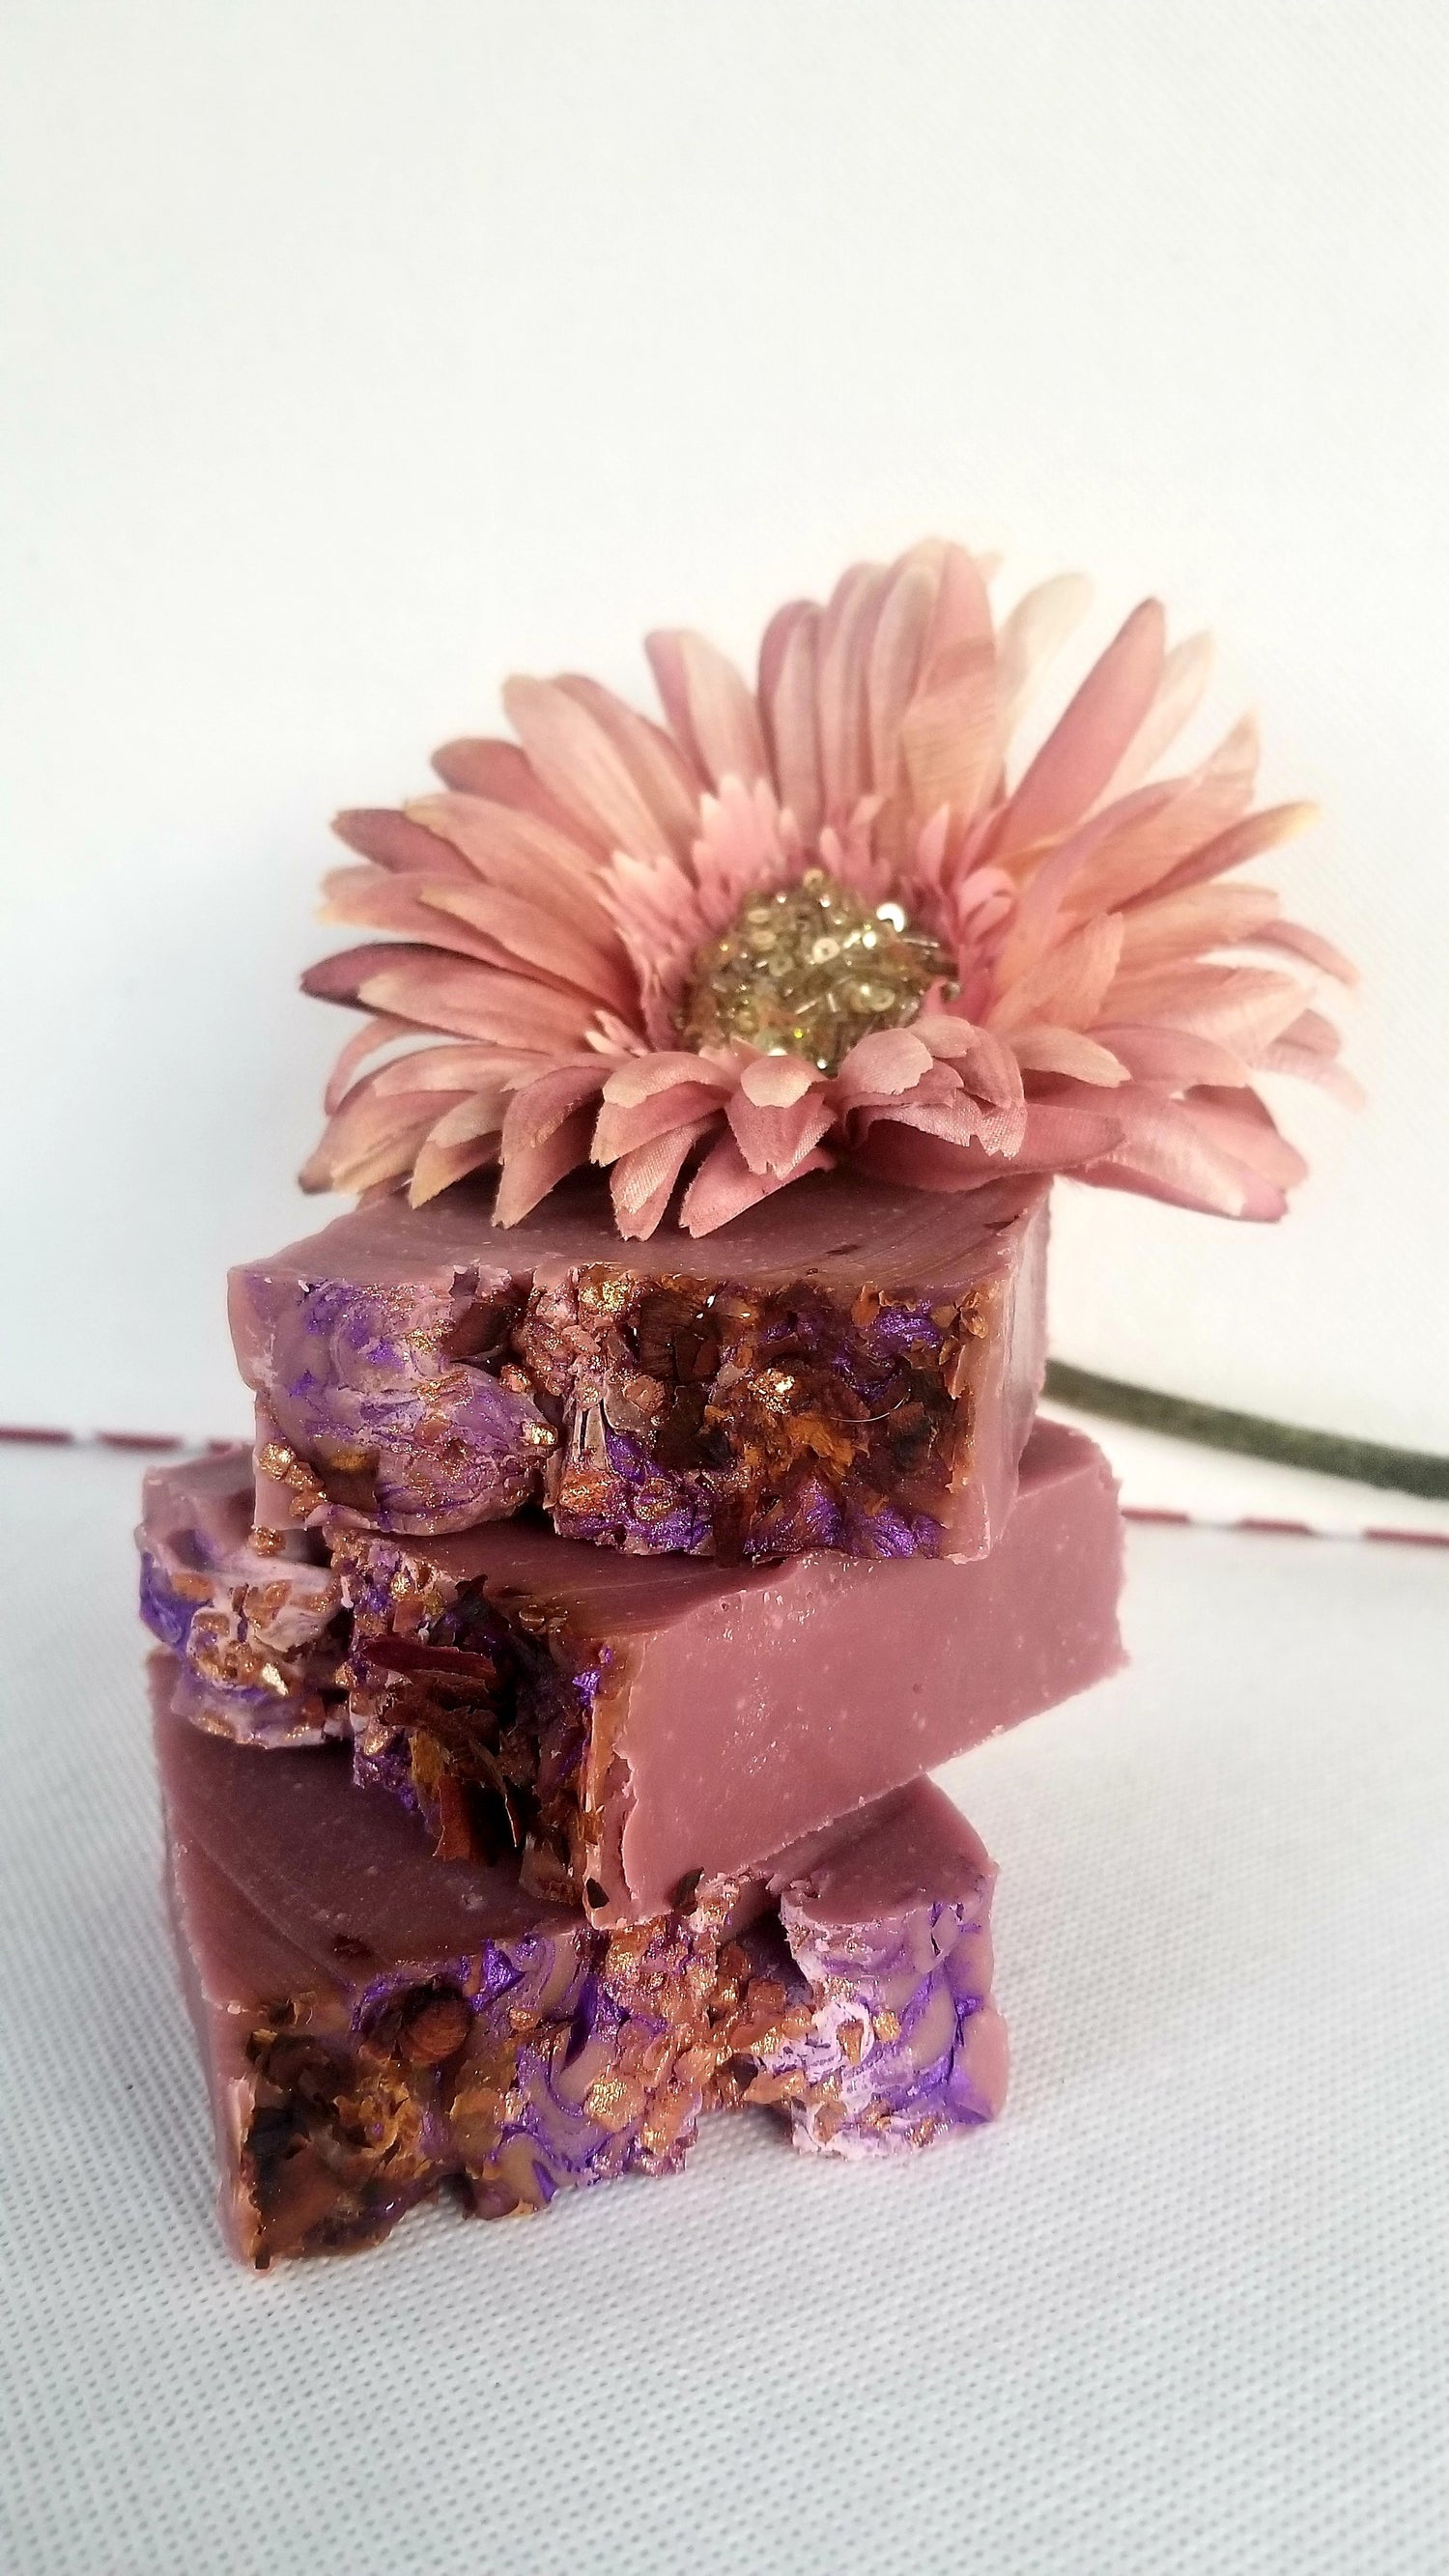 Image of Black Raspberry & Vanilla Currant Beauty Bar